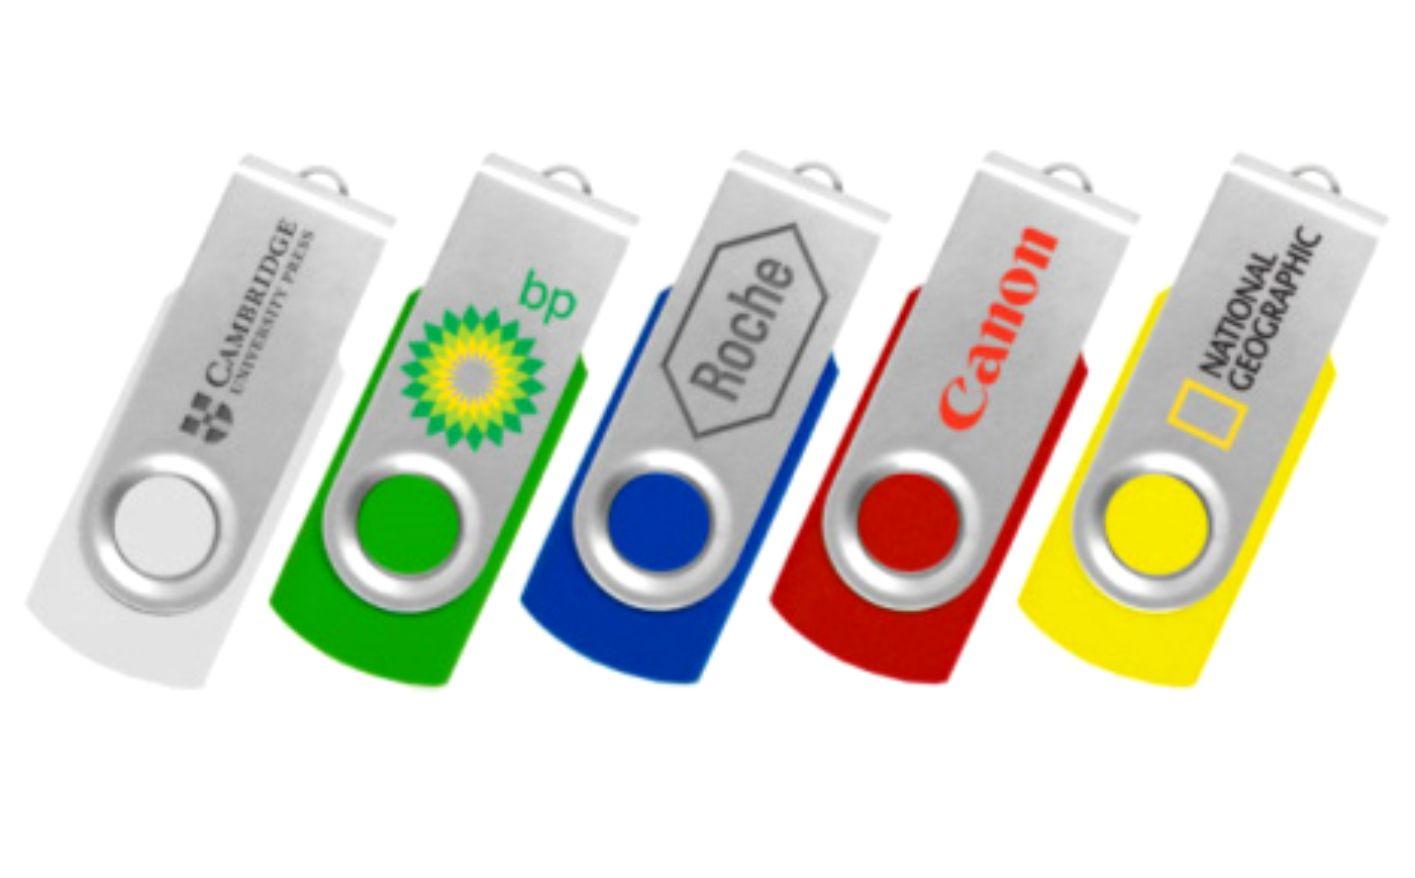 Флешки с логотипом компании